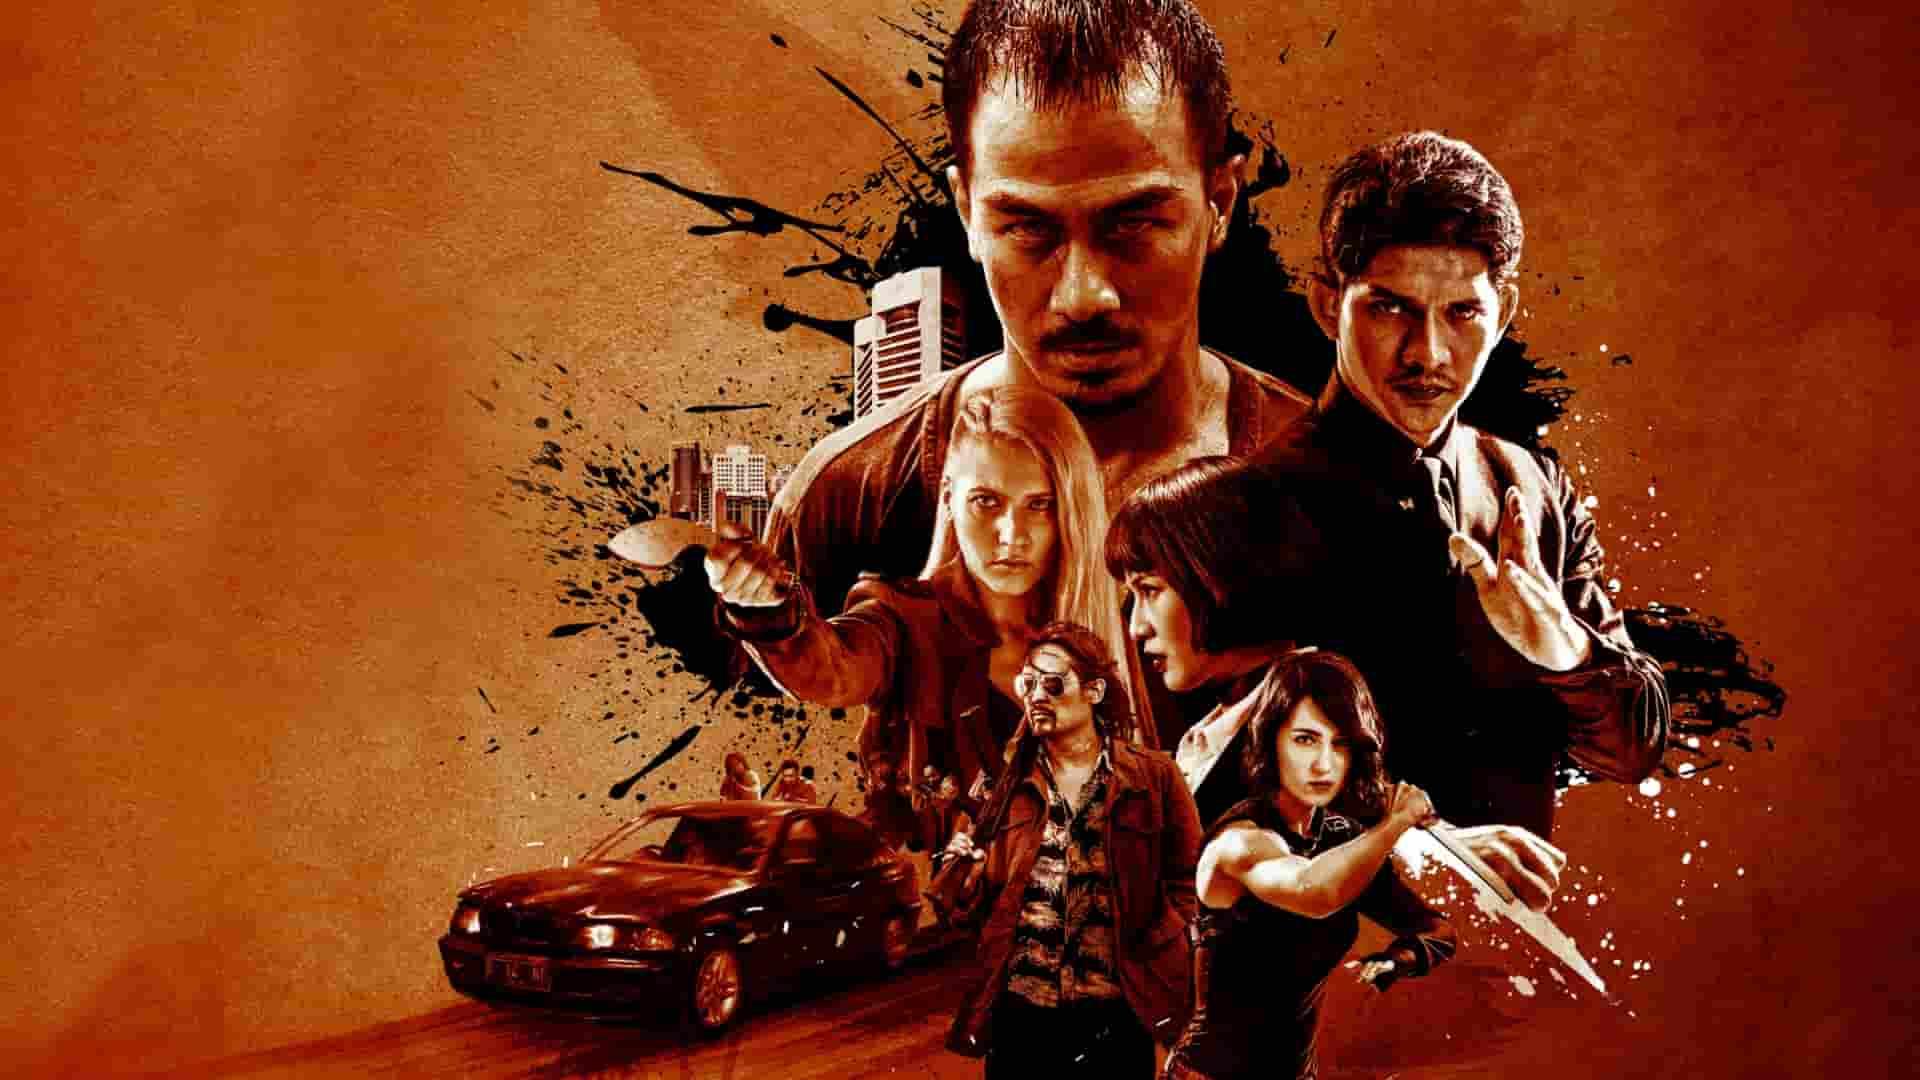 O2Tv Movies: Free Download O2TvMovies.Com 2020 Movies Online